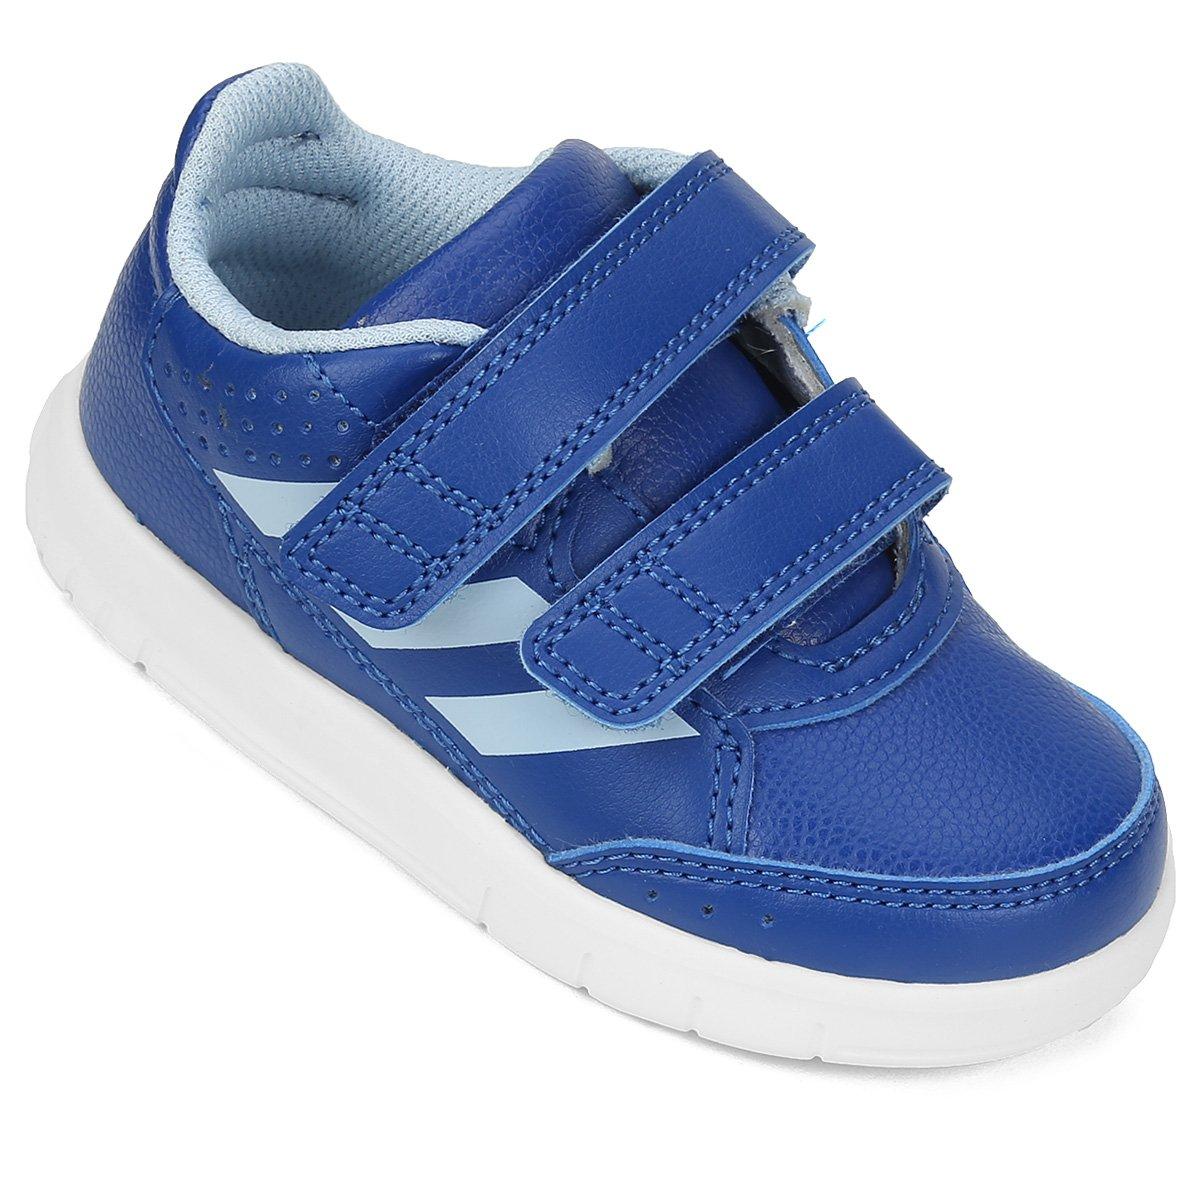 b0645b47ad21c Tênis Infantil Adidas Altasport Cf Velcro